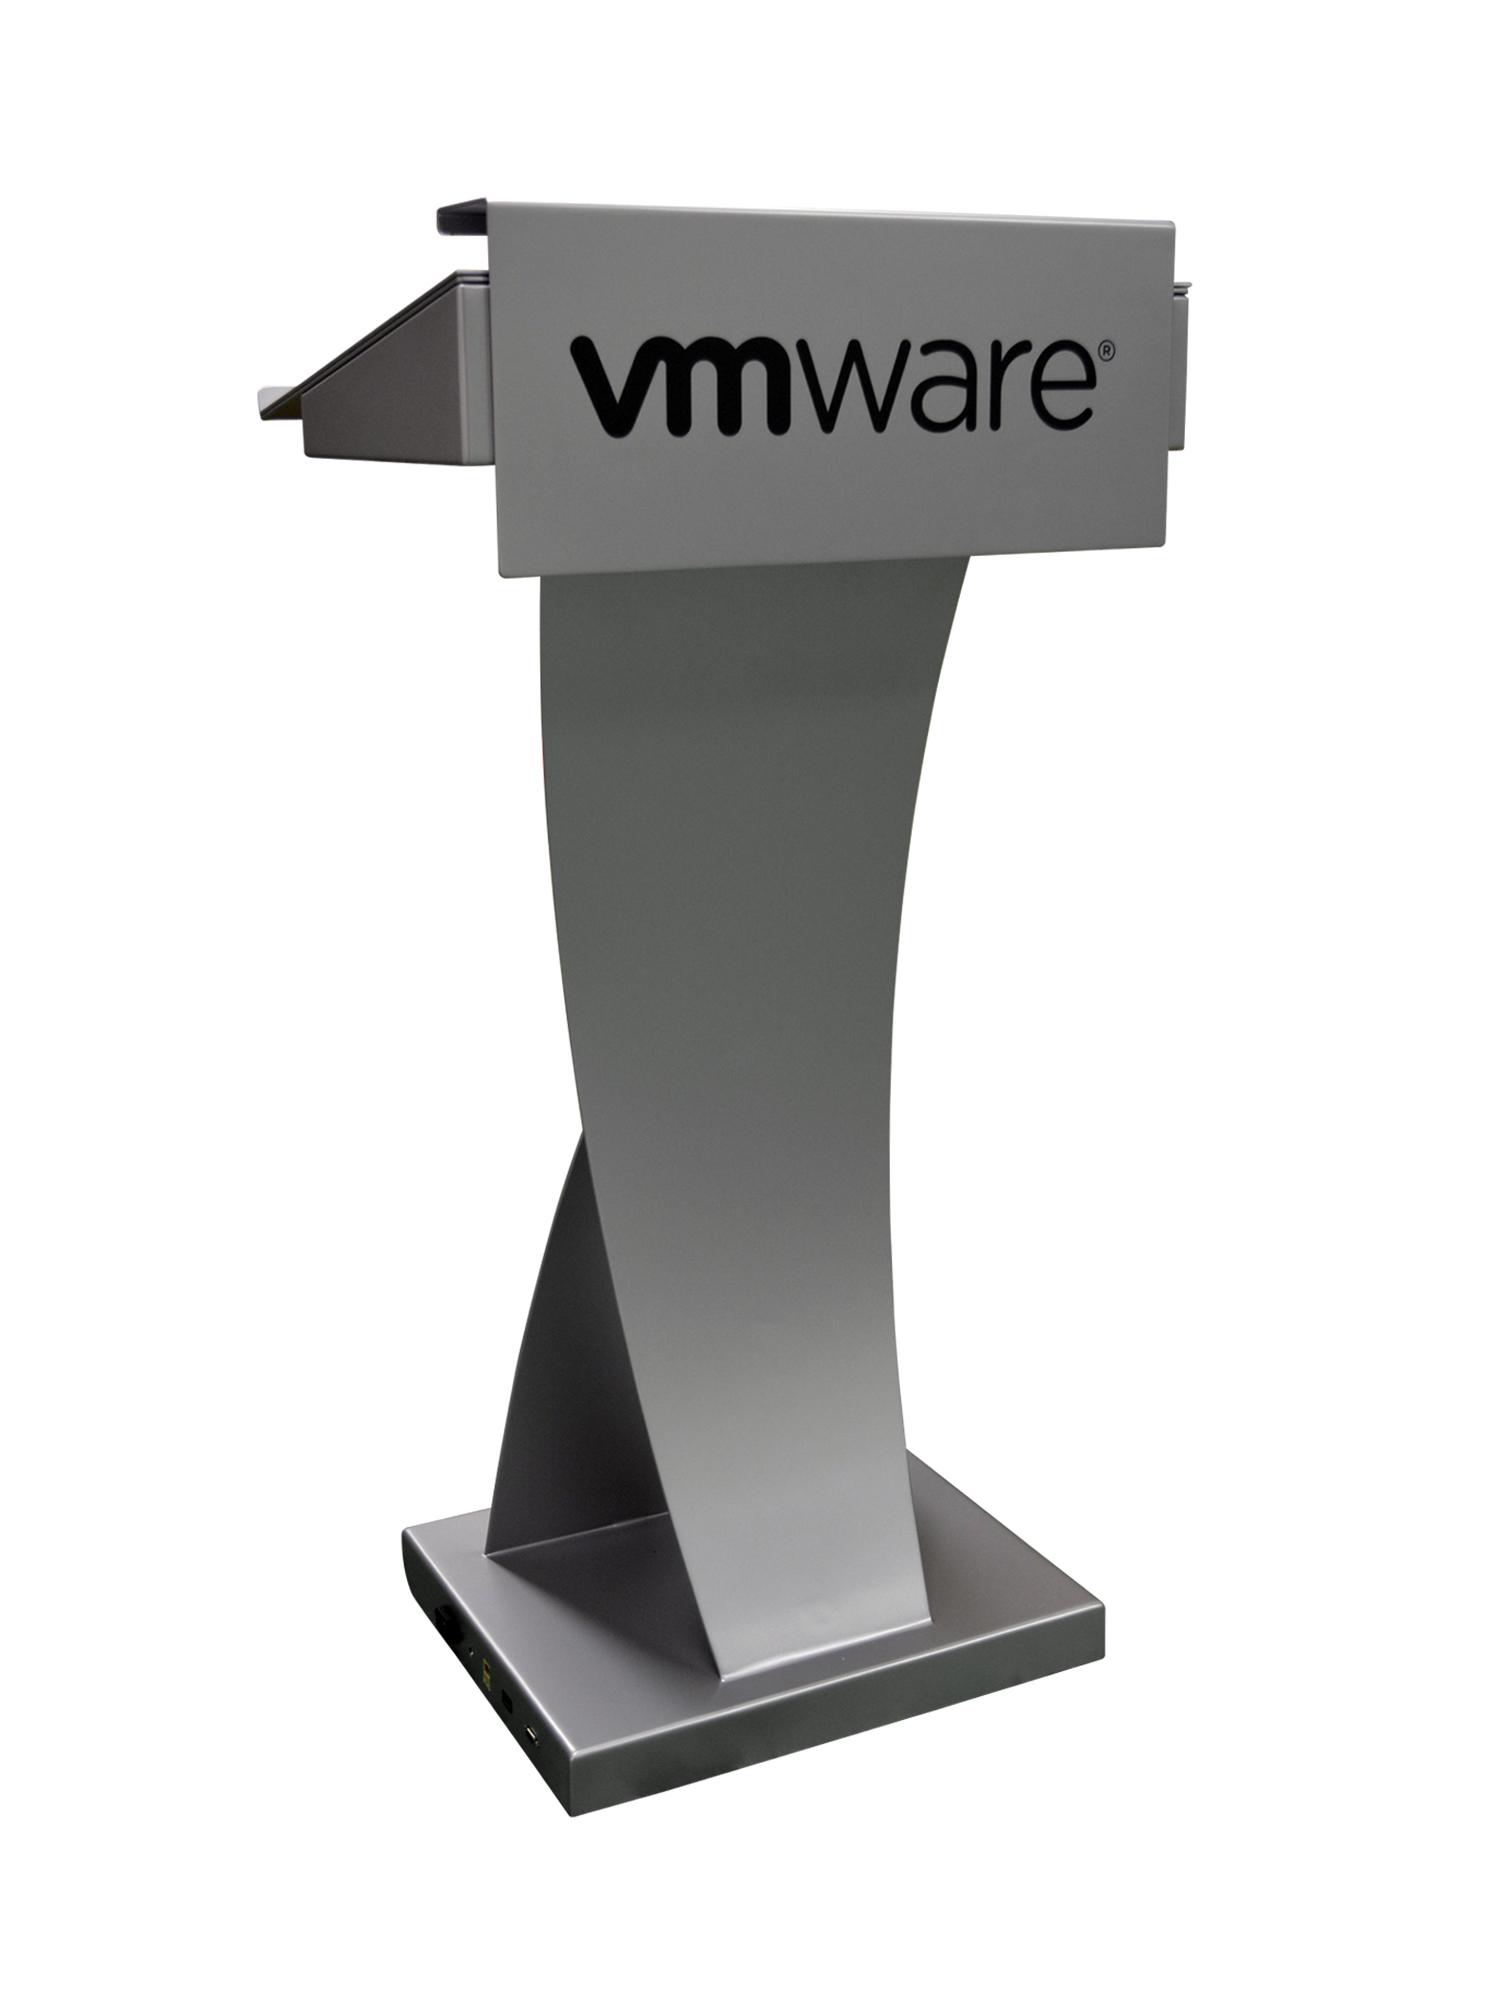 VMware Singapore